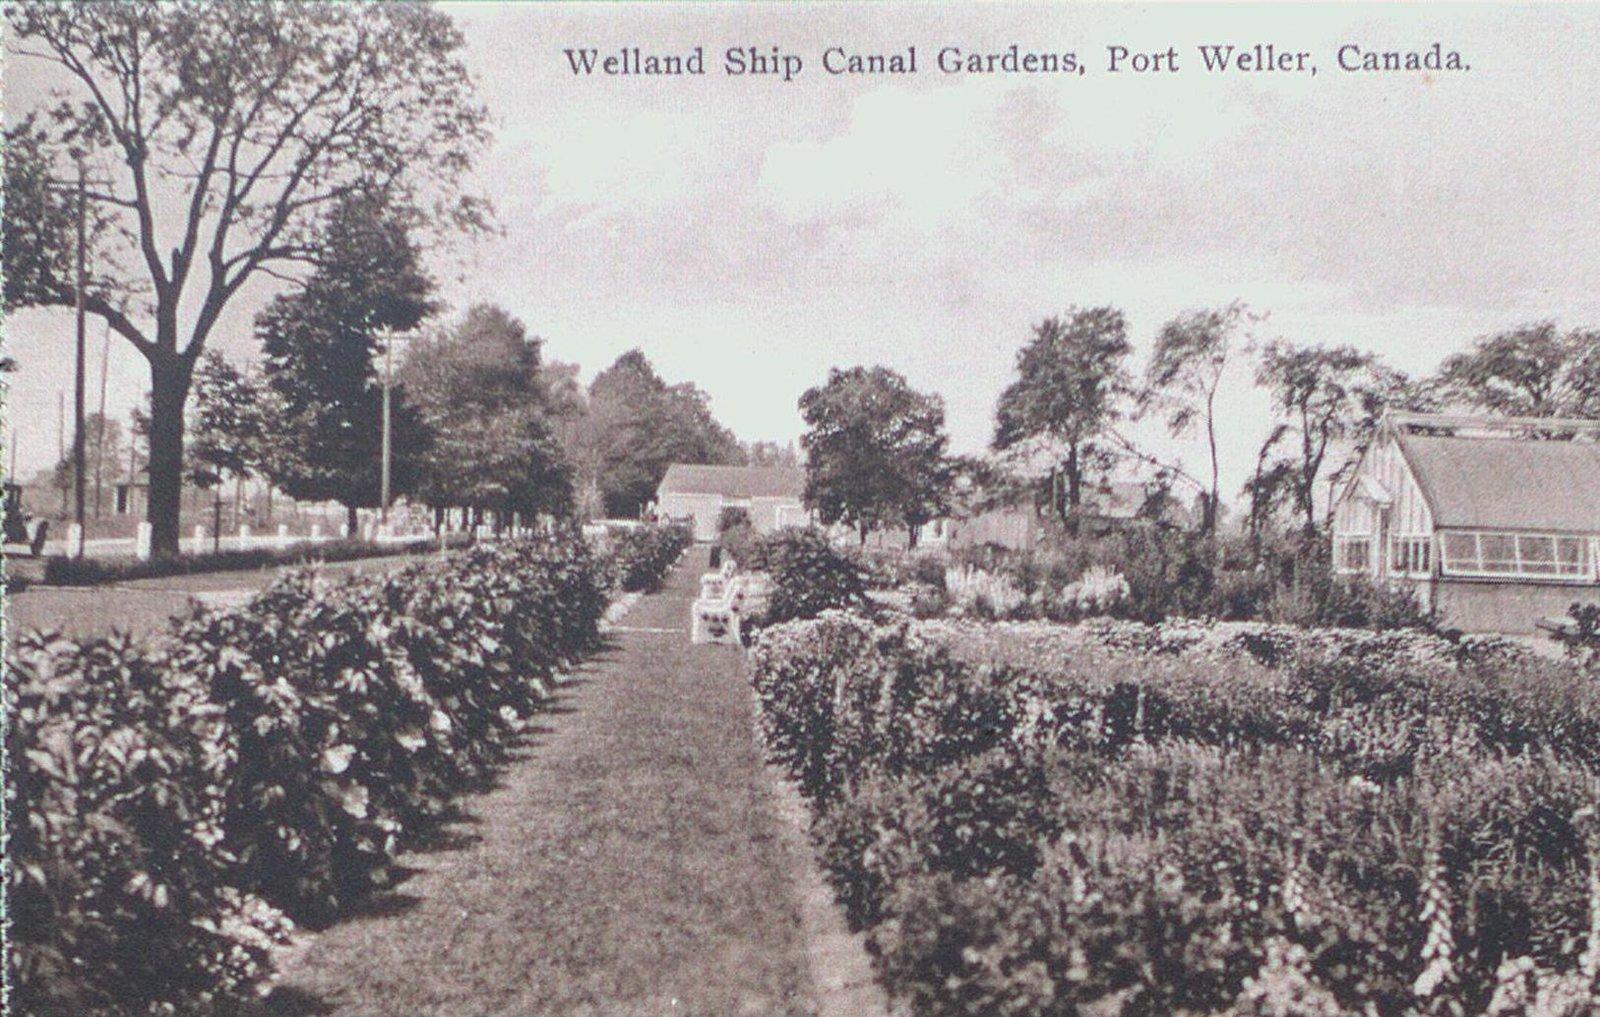 Welland Ship Canal Gardens